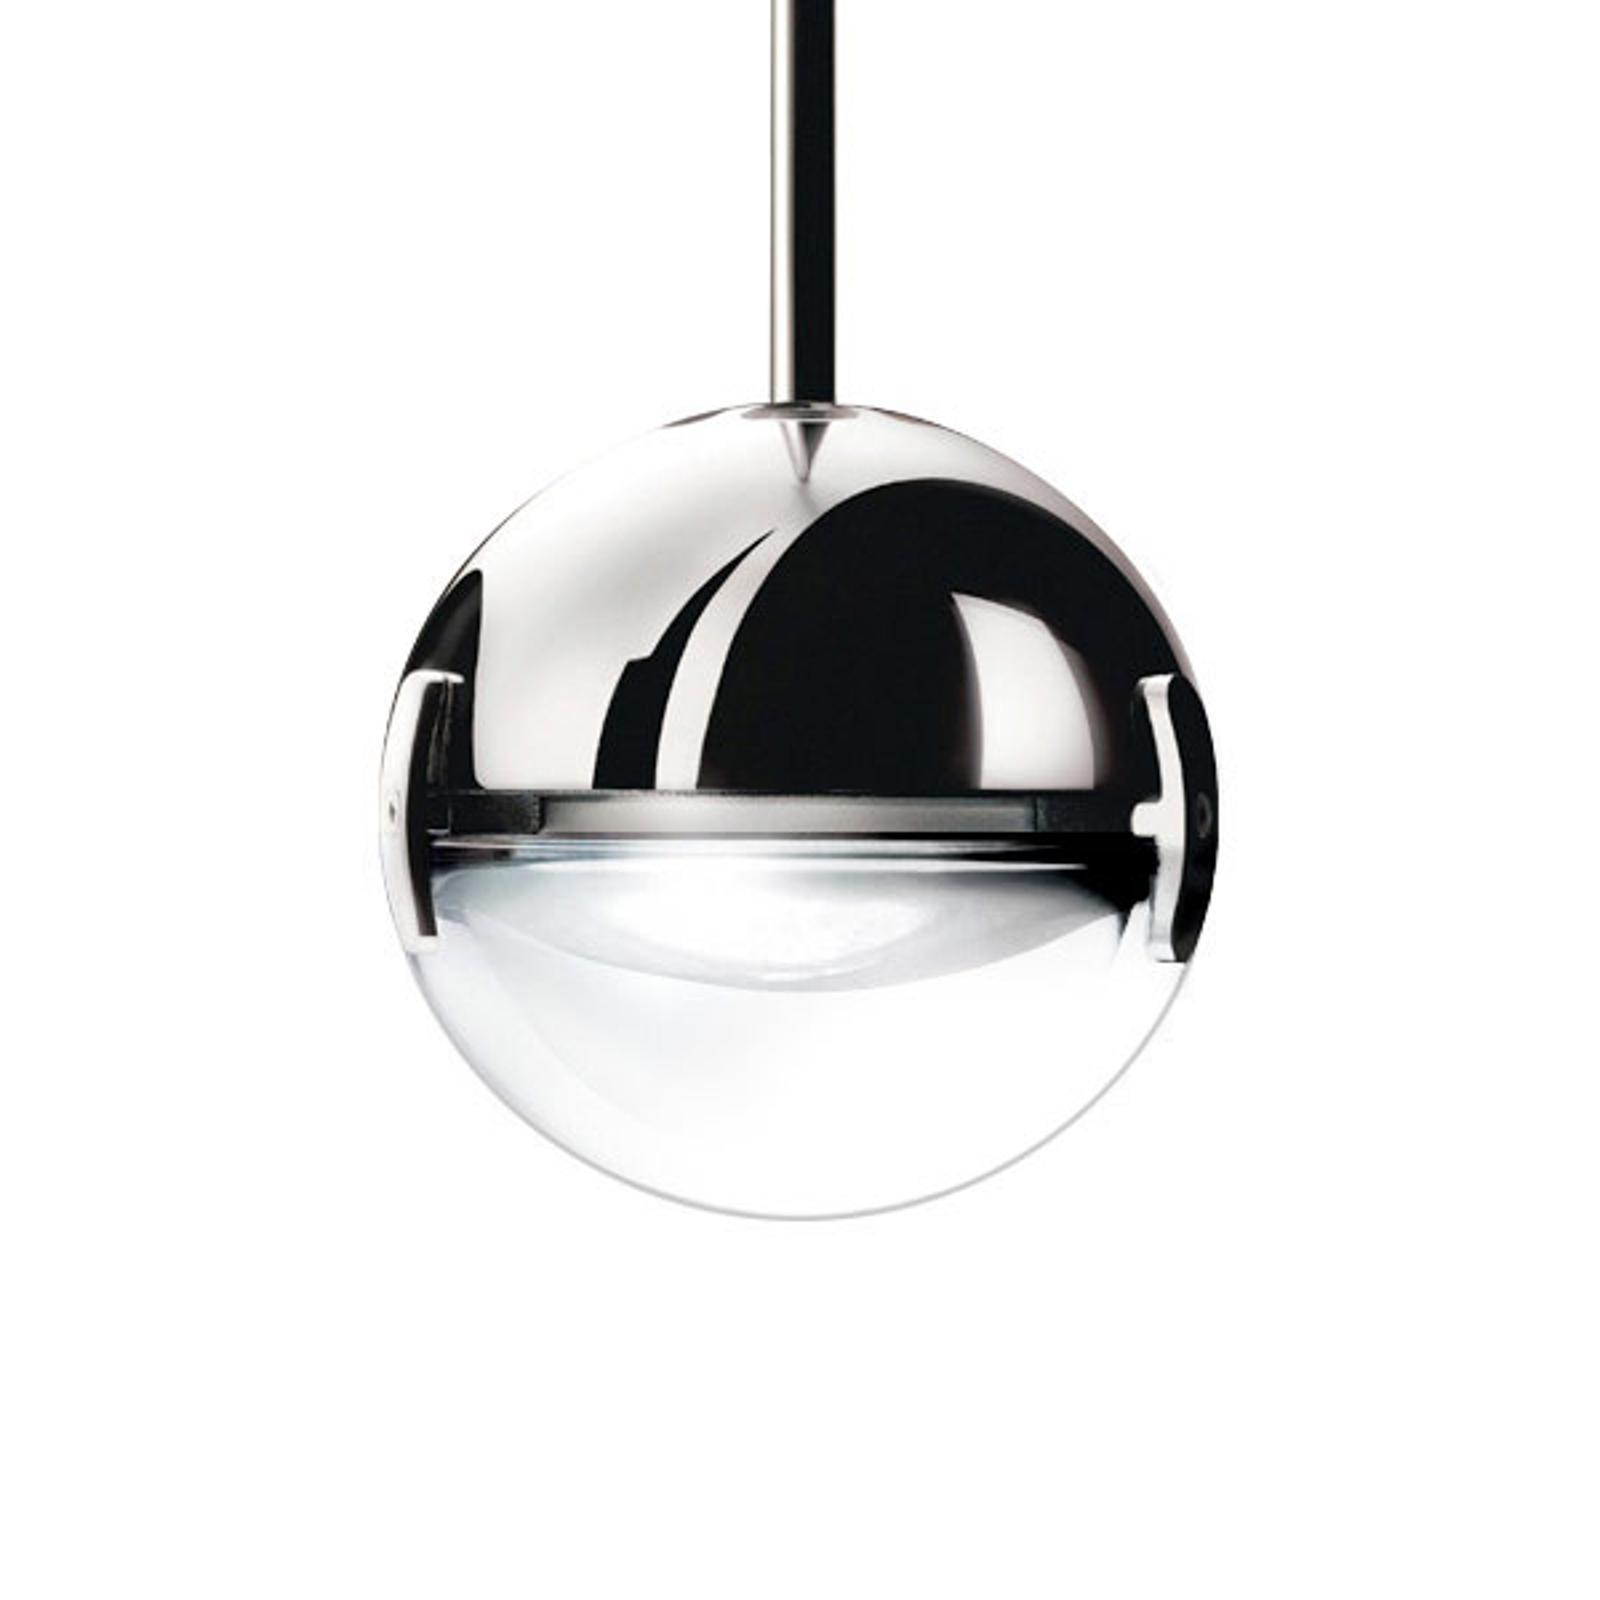 Cini&Nils Convivio LED-Pendelleuchte klar, Casambi